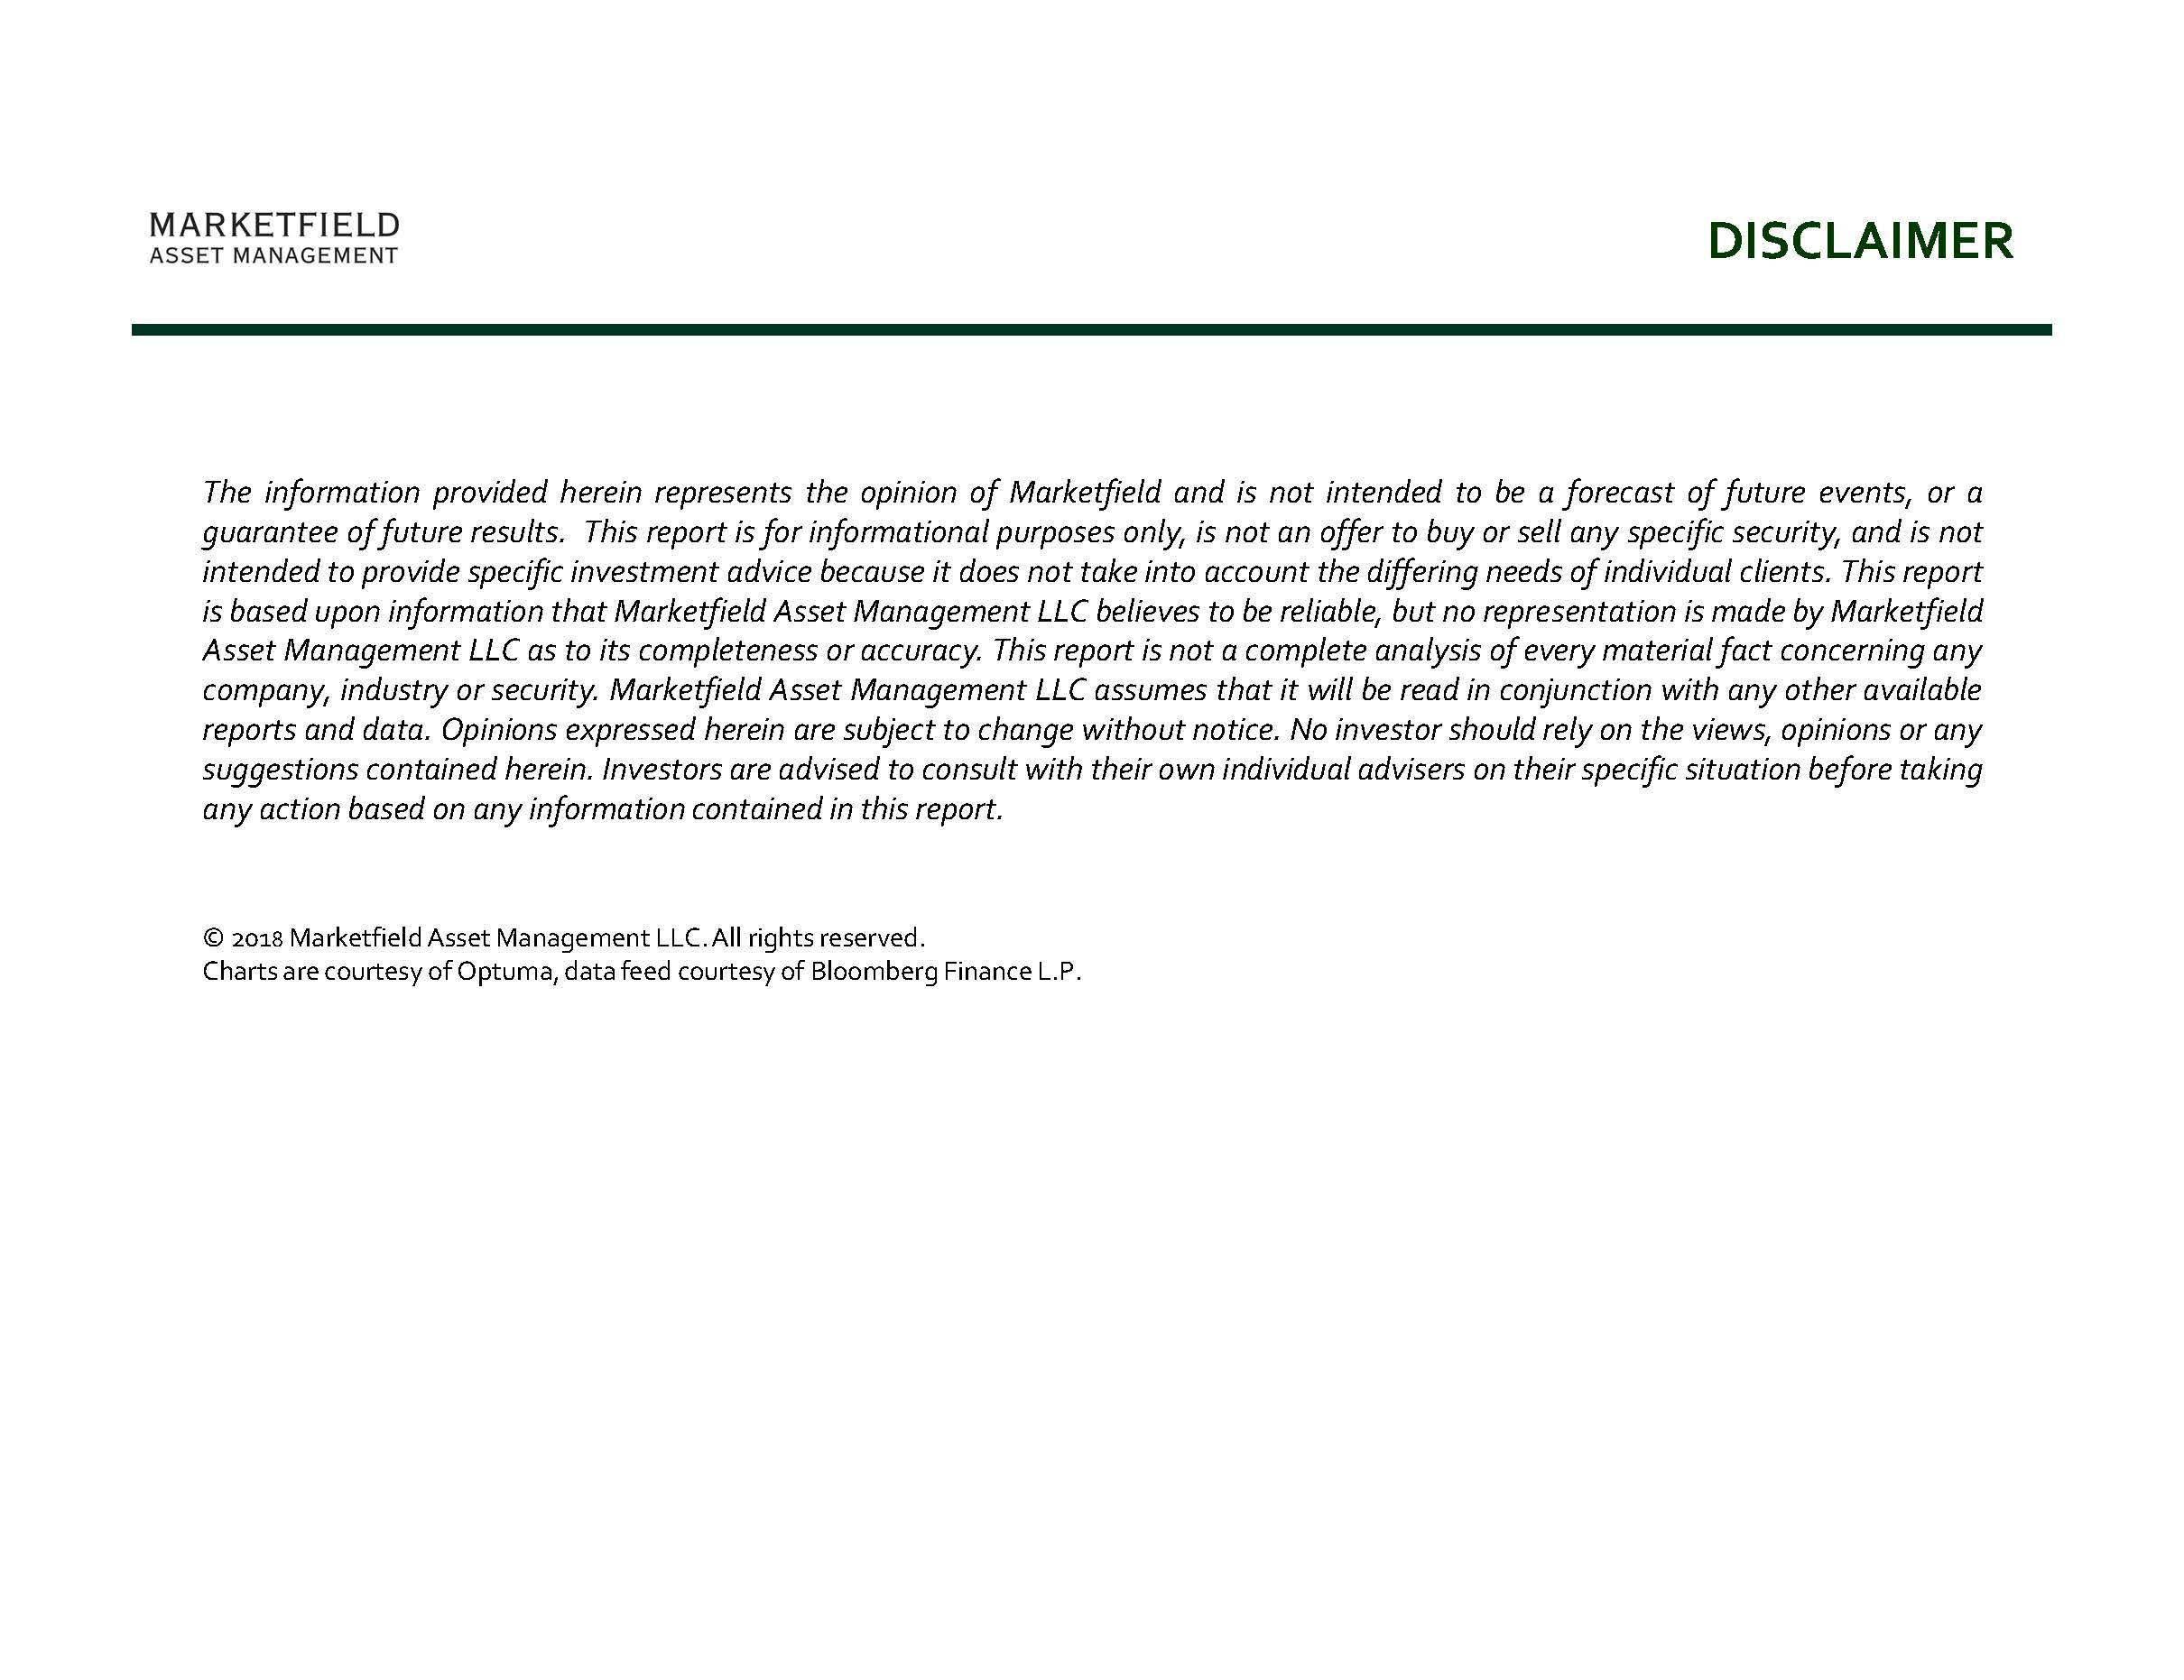 marketfield weekly speculator 01-04-18_Page_14.jpg